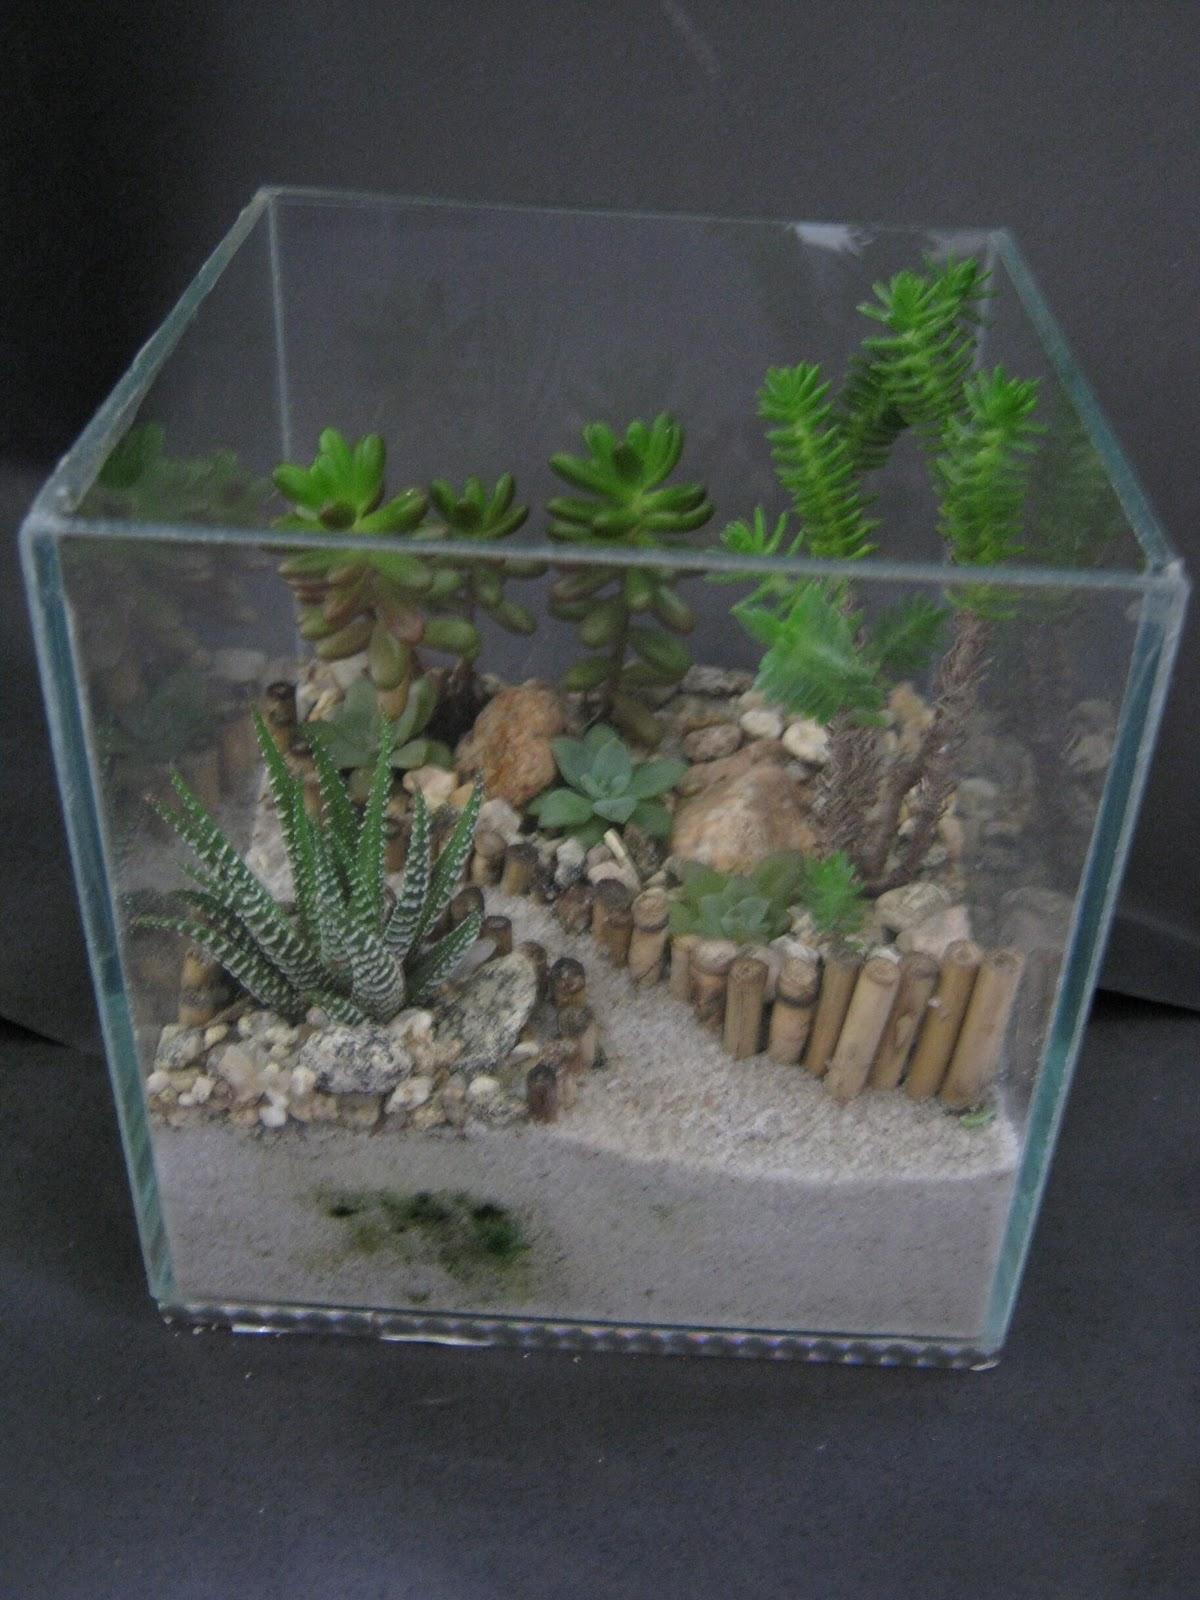 mini jardins em vidro : mini jardins em vidro: : Mini-Jardins de Suculentas em Vidro e em cachepô de madeira